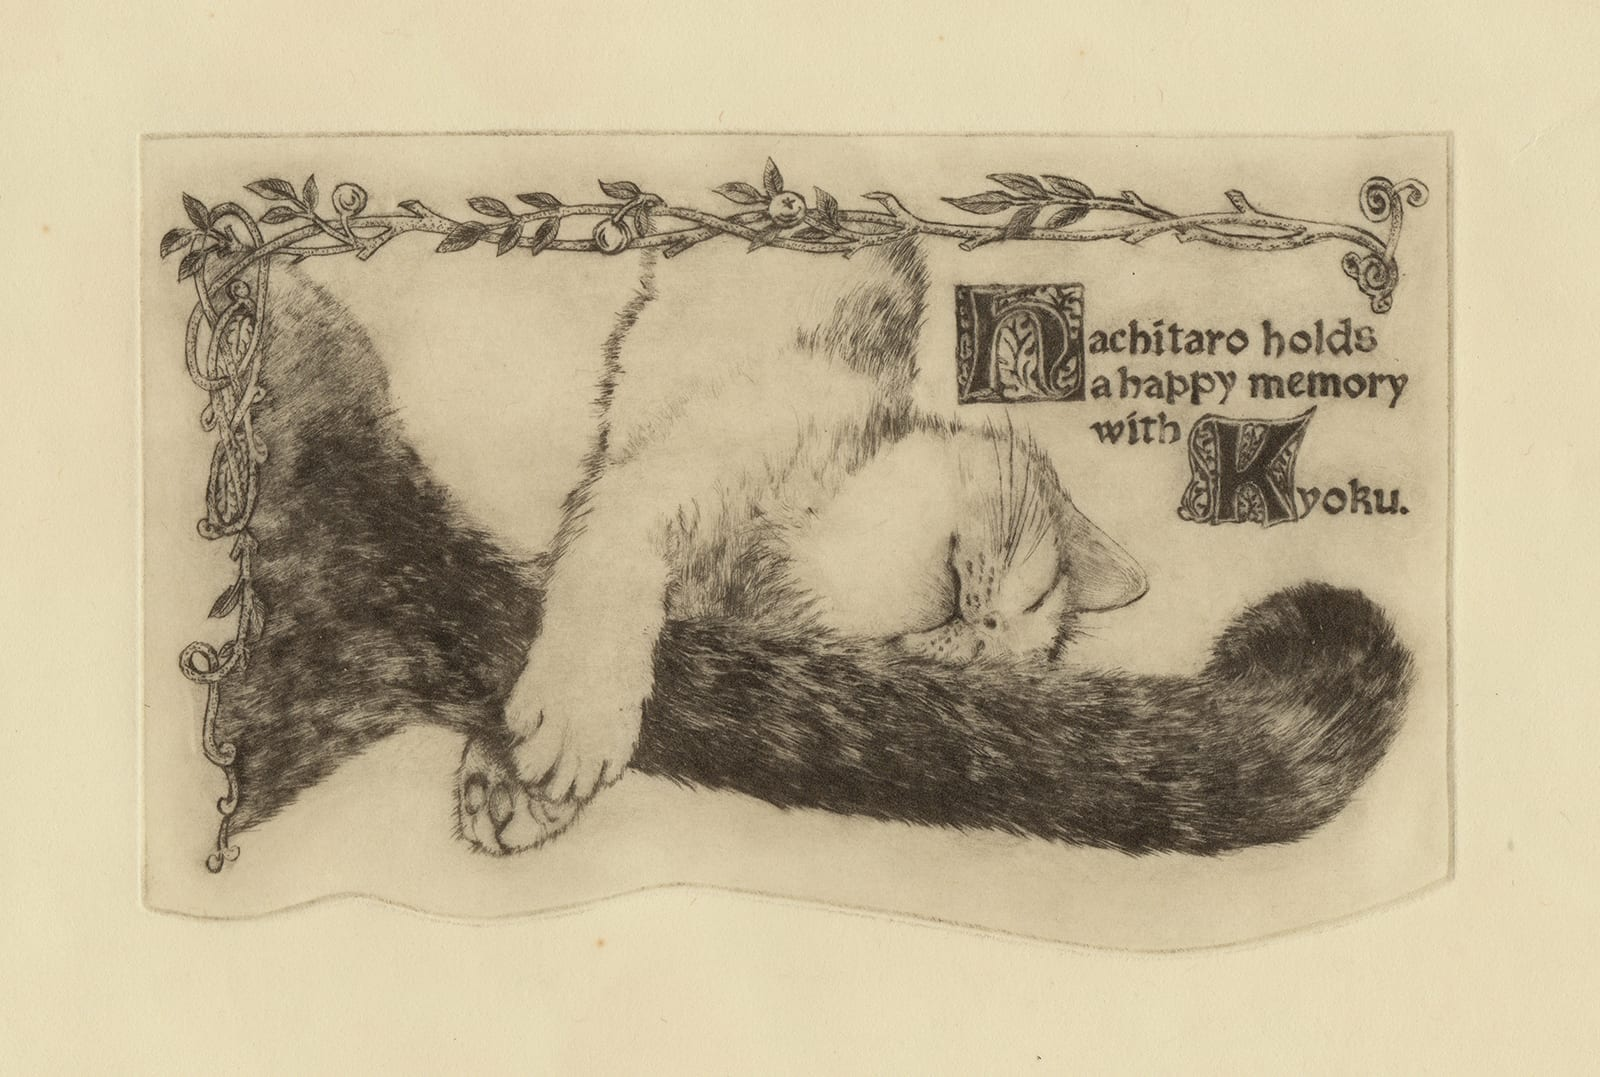 Hachitaro's memory (drypoint etching by Yaemi Shigyo)